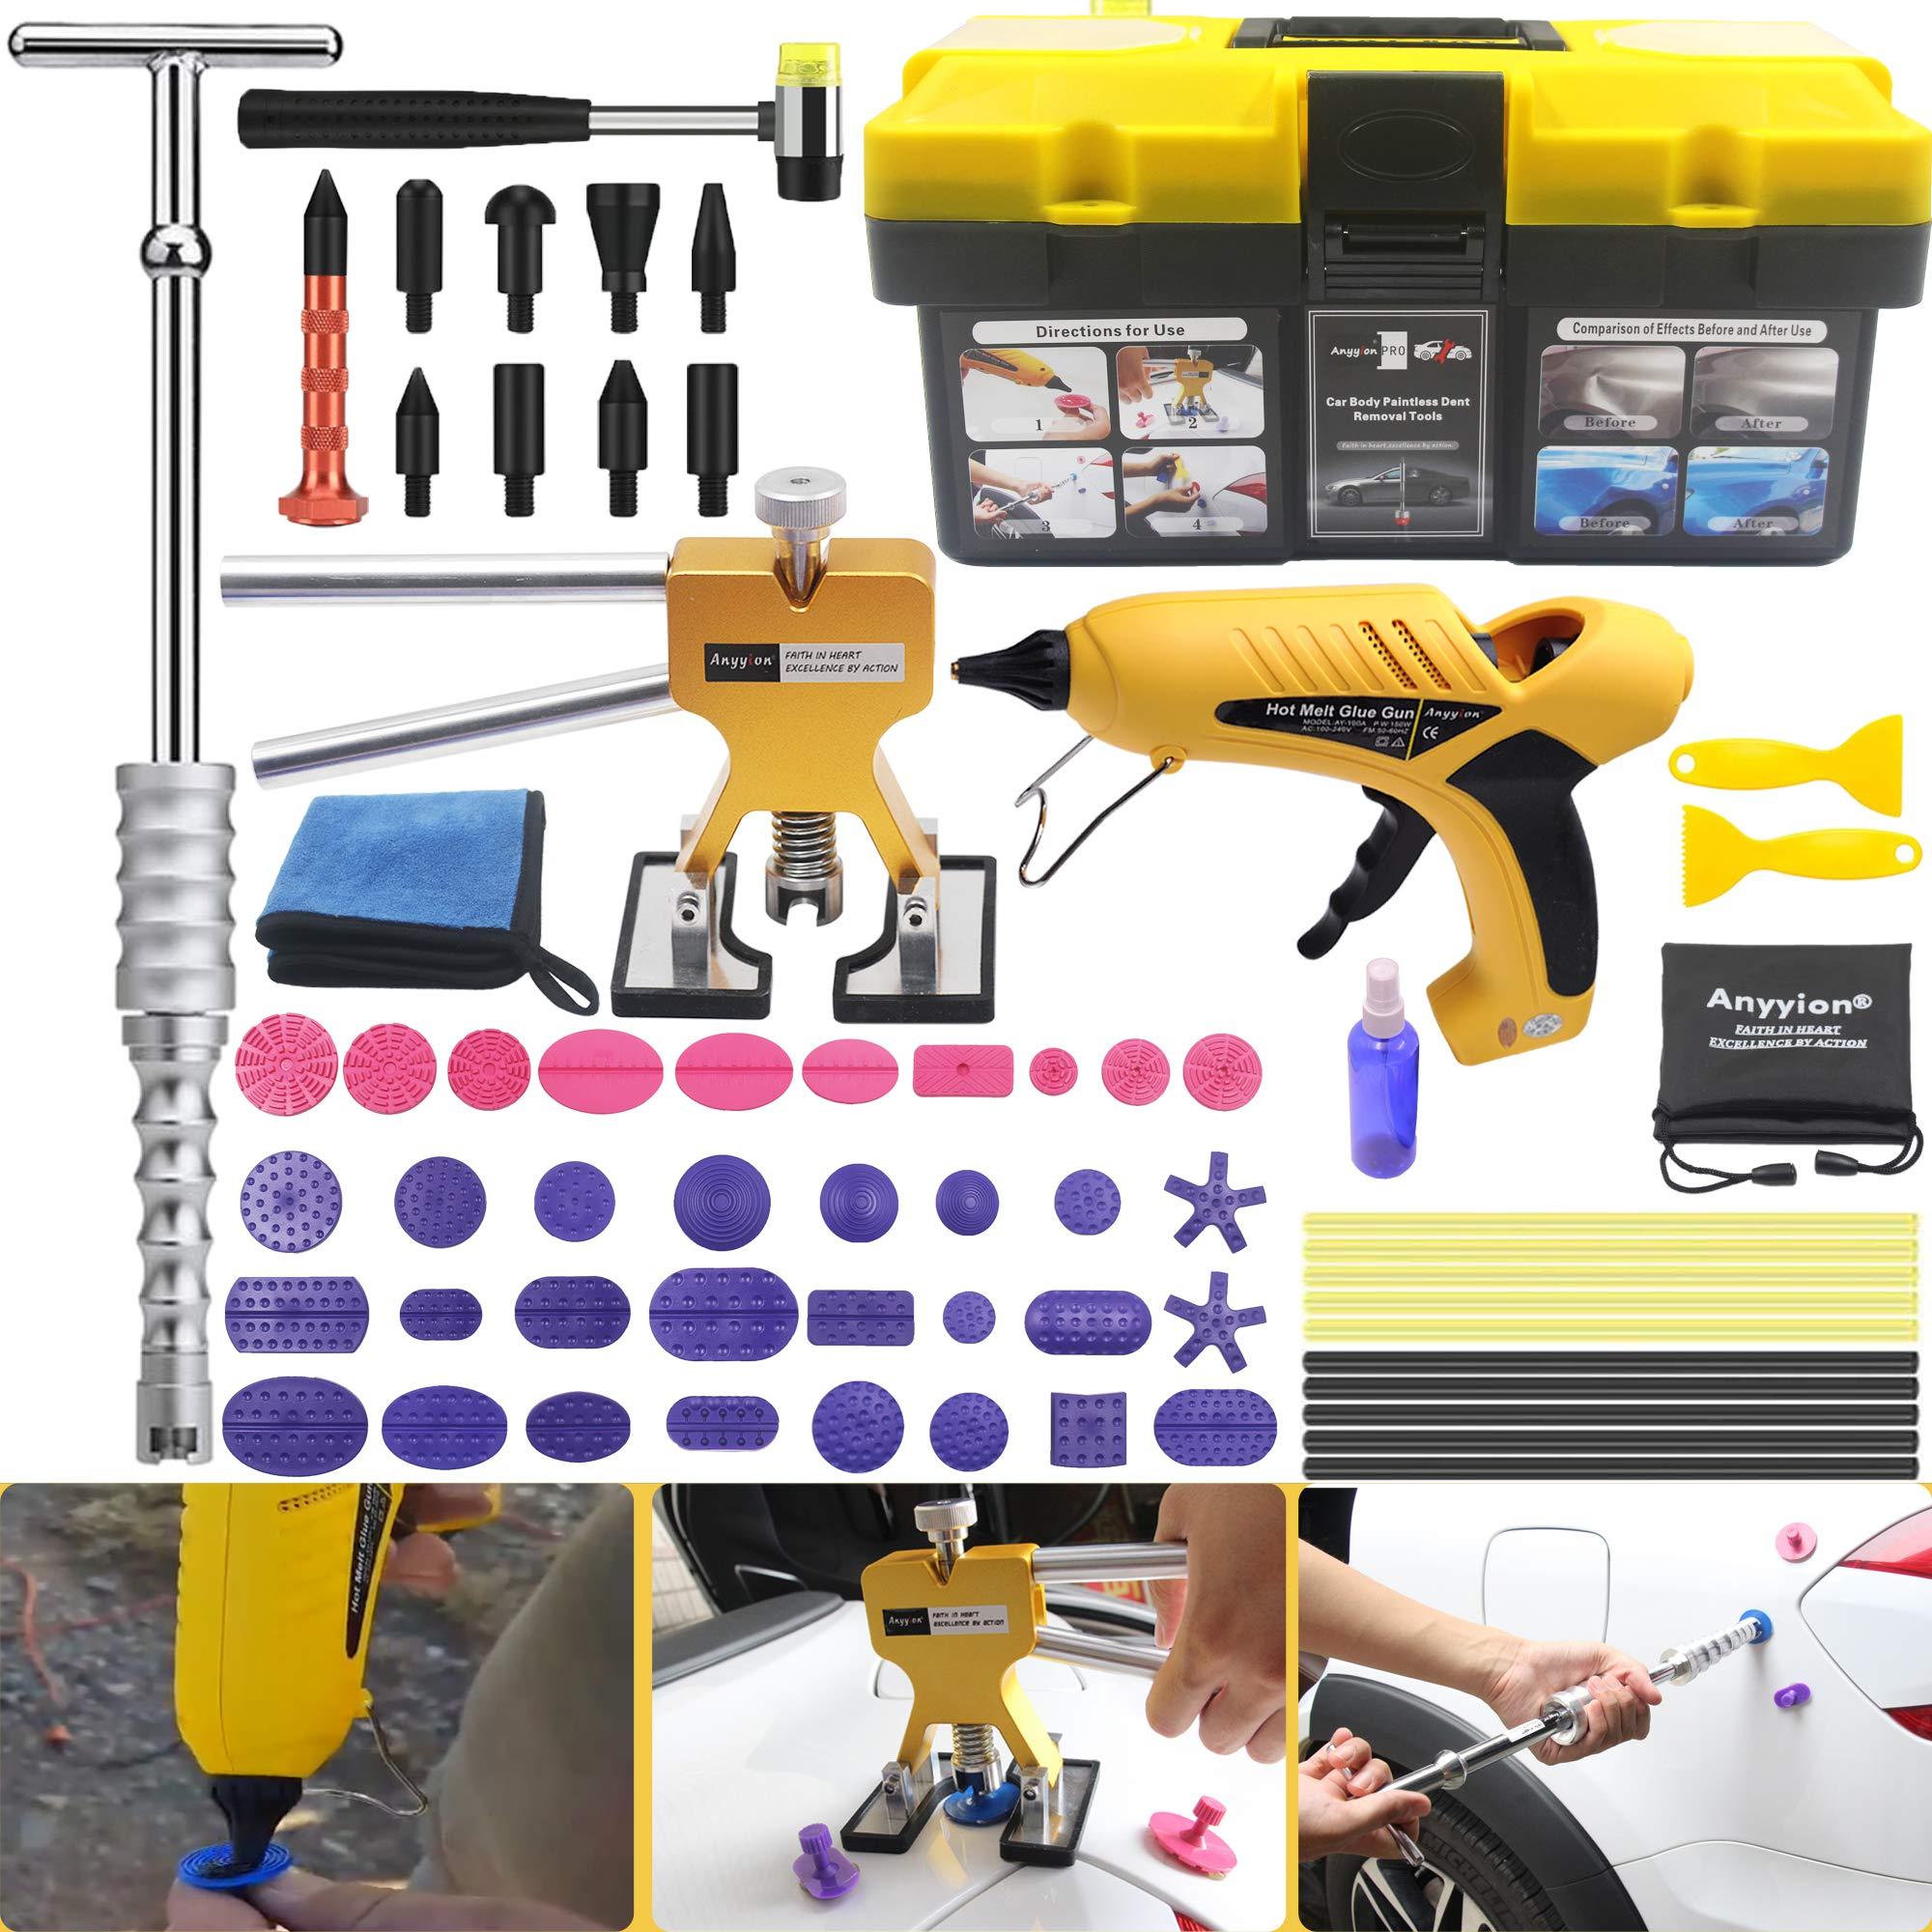 Anyyion Paintless Dent Repair Kits - 64pcs Car Body Paintless Dent Repair Tools -Auto Dent Puller Kit Automotive Door Ding Dent Silde Hammer Glue Puller Repair Starter Set Kits for Car Hail Damage